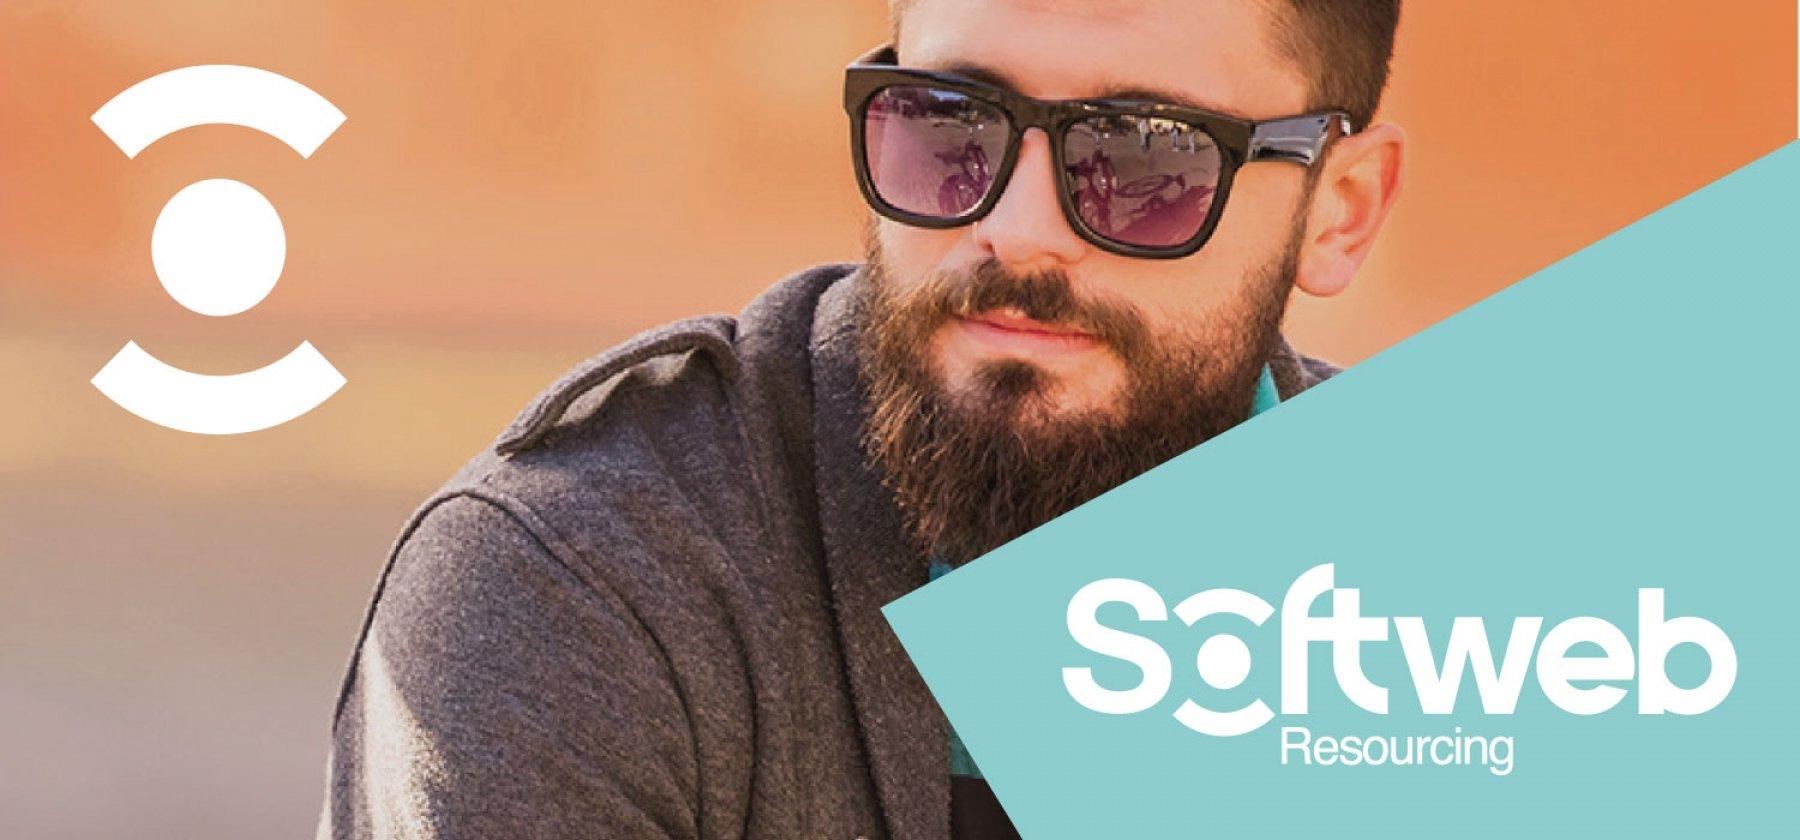 SoftW_1500x700-1